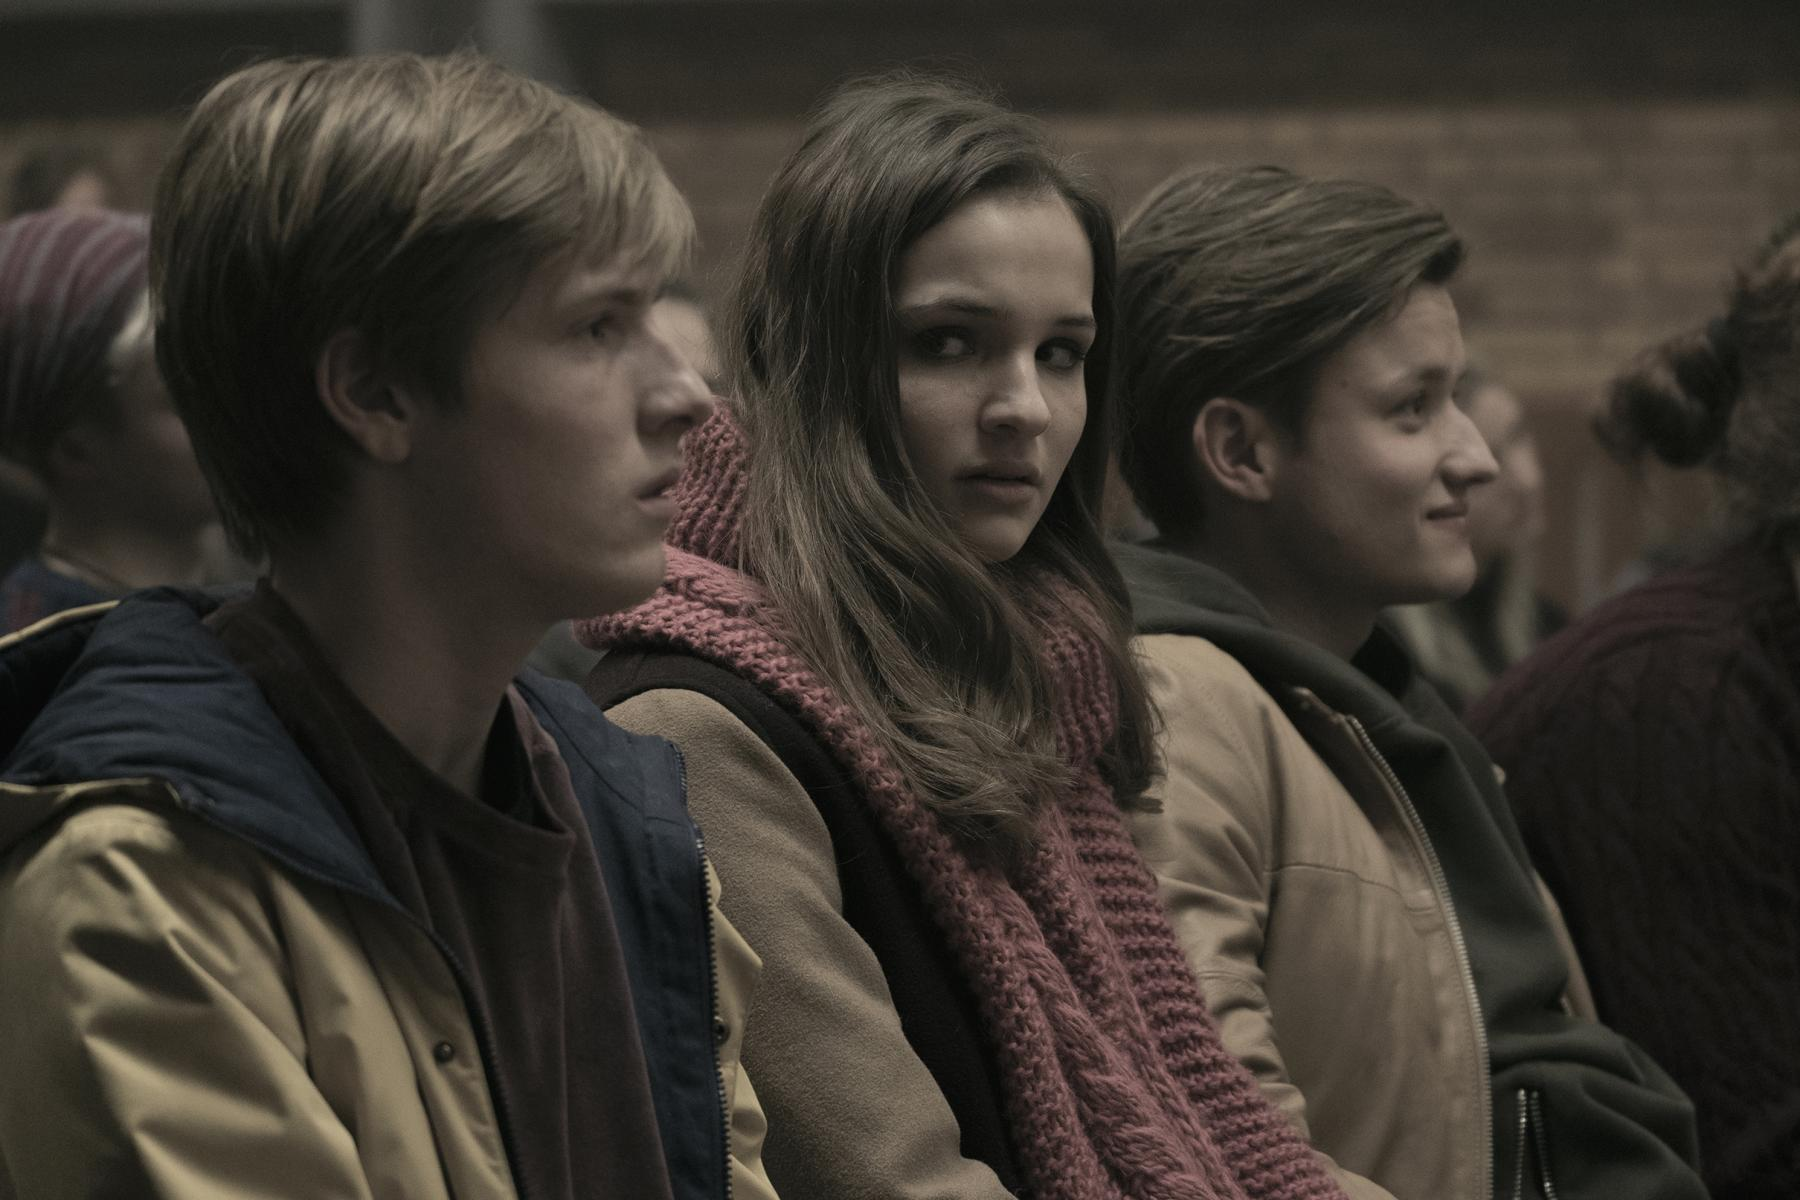 Image gallery for Dark (TV Series) - FilmAffinity